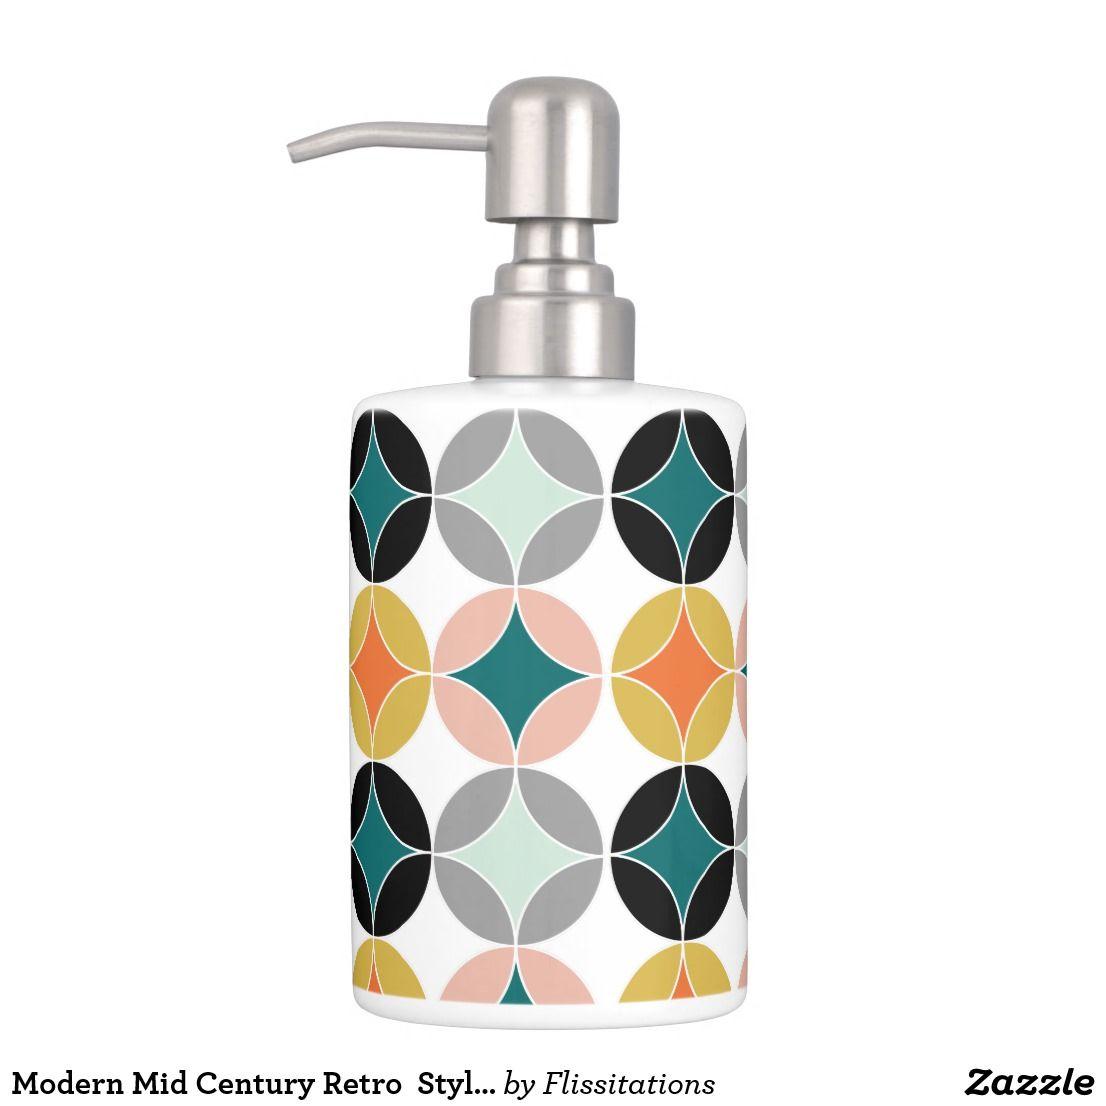 Modern Mid Century Retro Style Repeat Patterned Bathroom Set | Retro ...